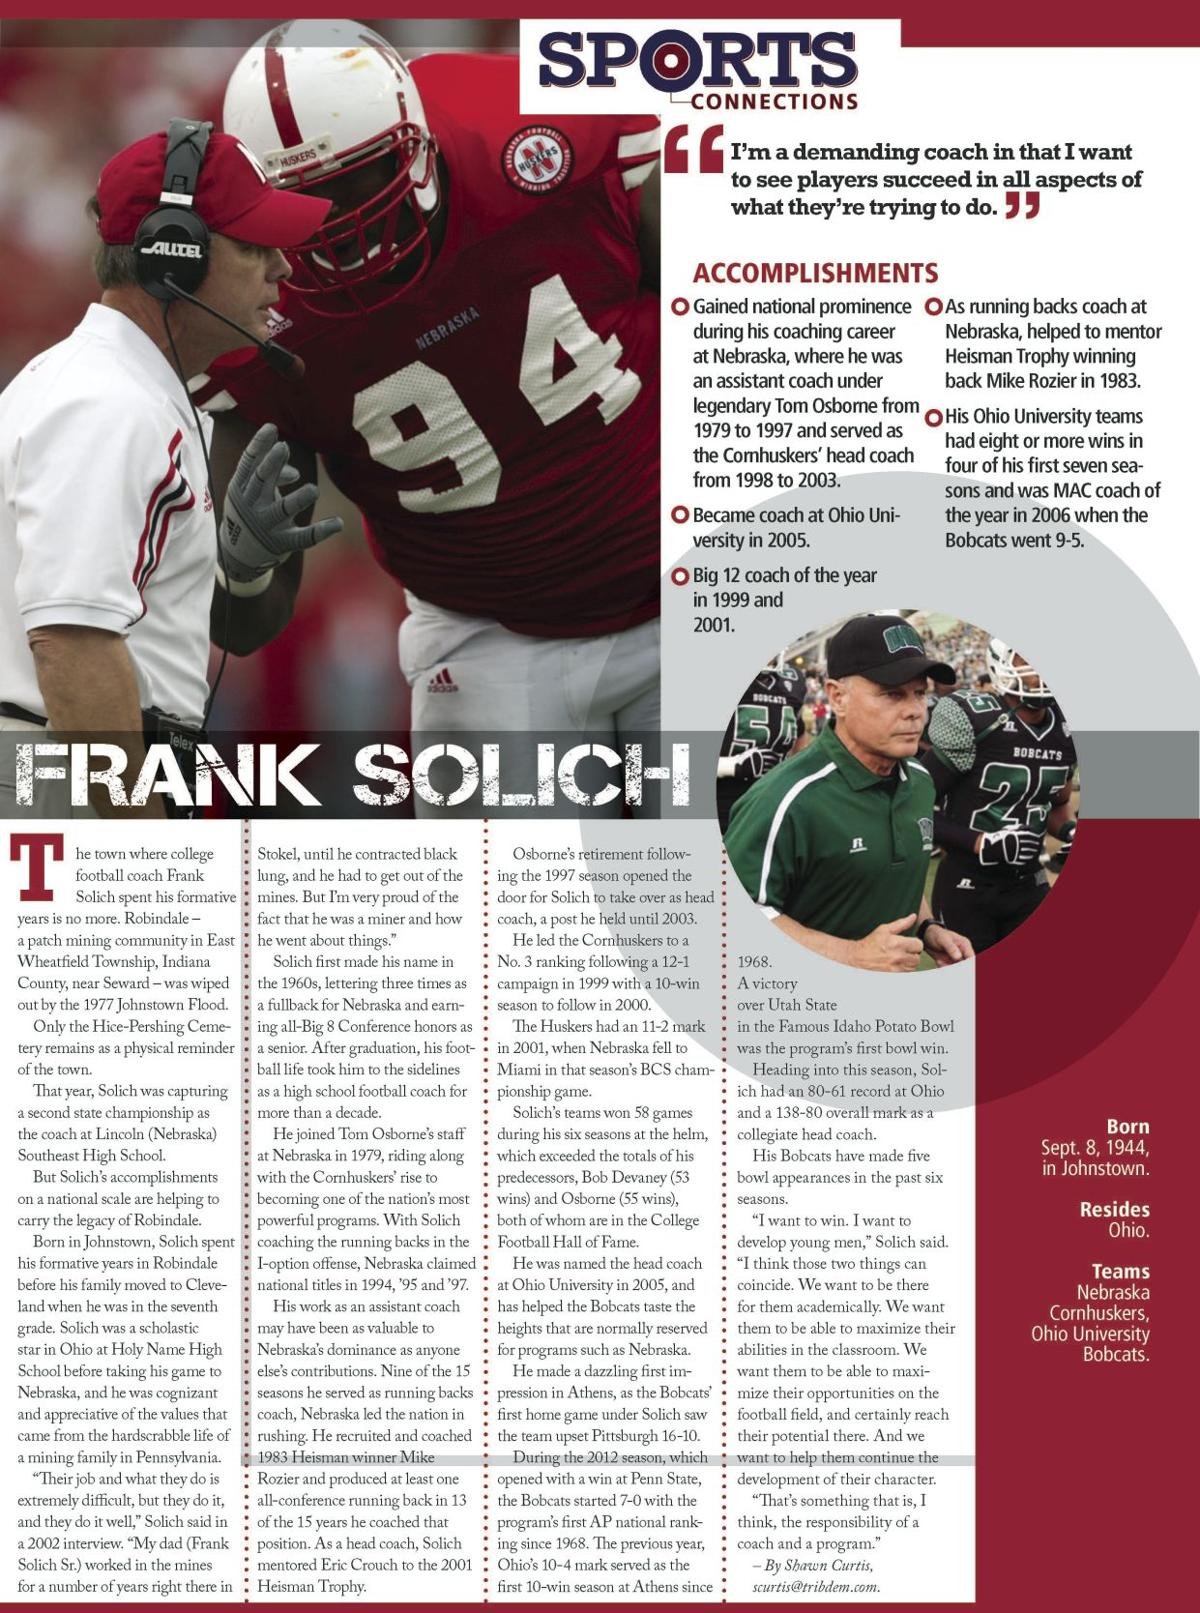 Frank Solich